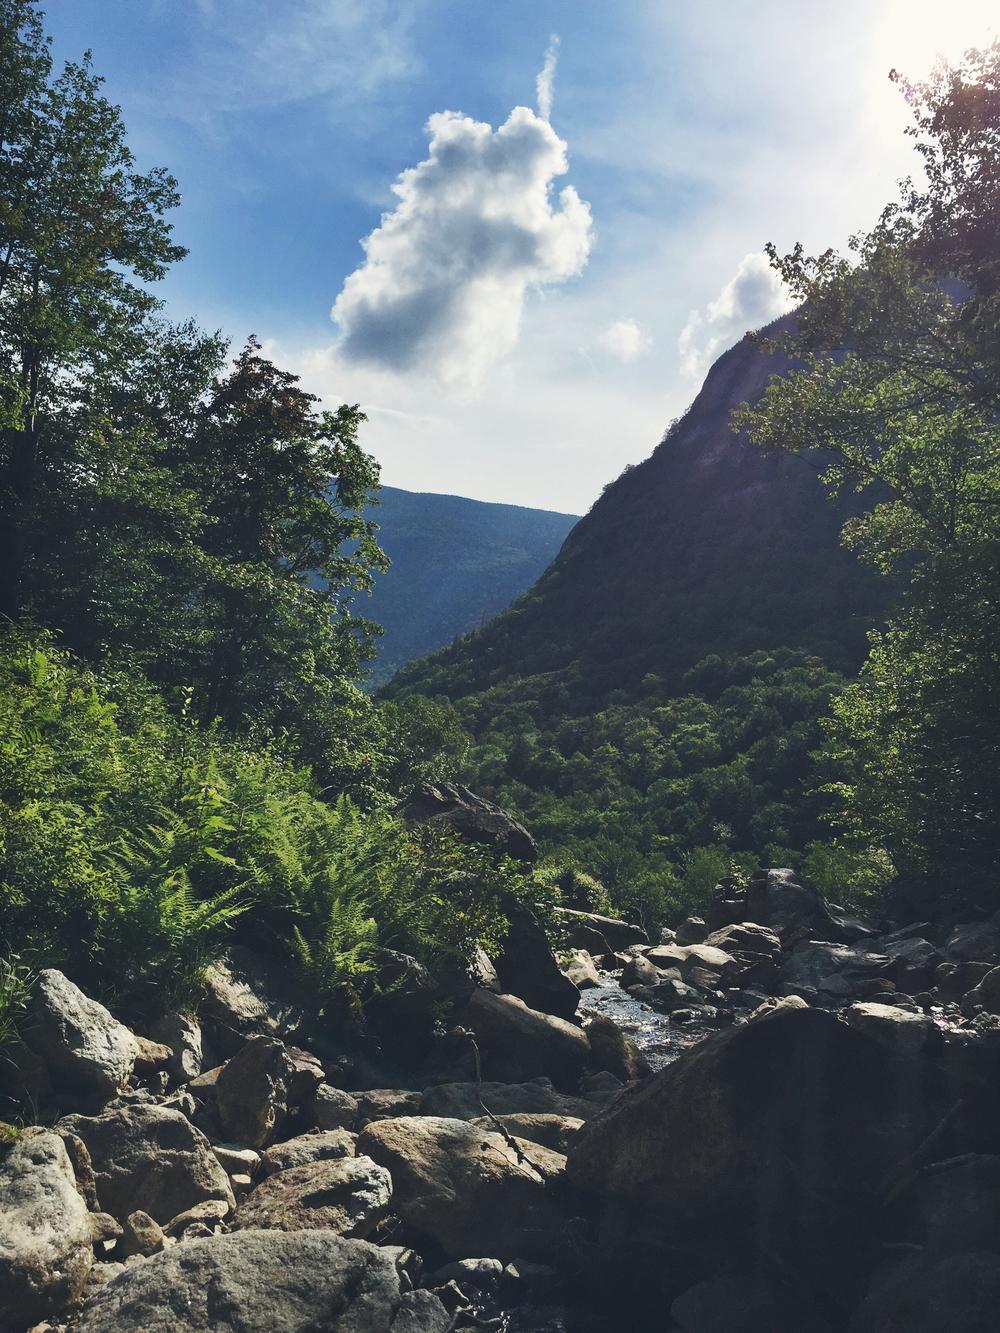 Scenery around Silver Cascades.